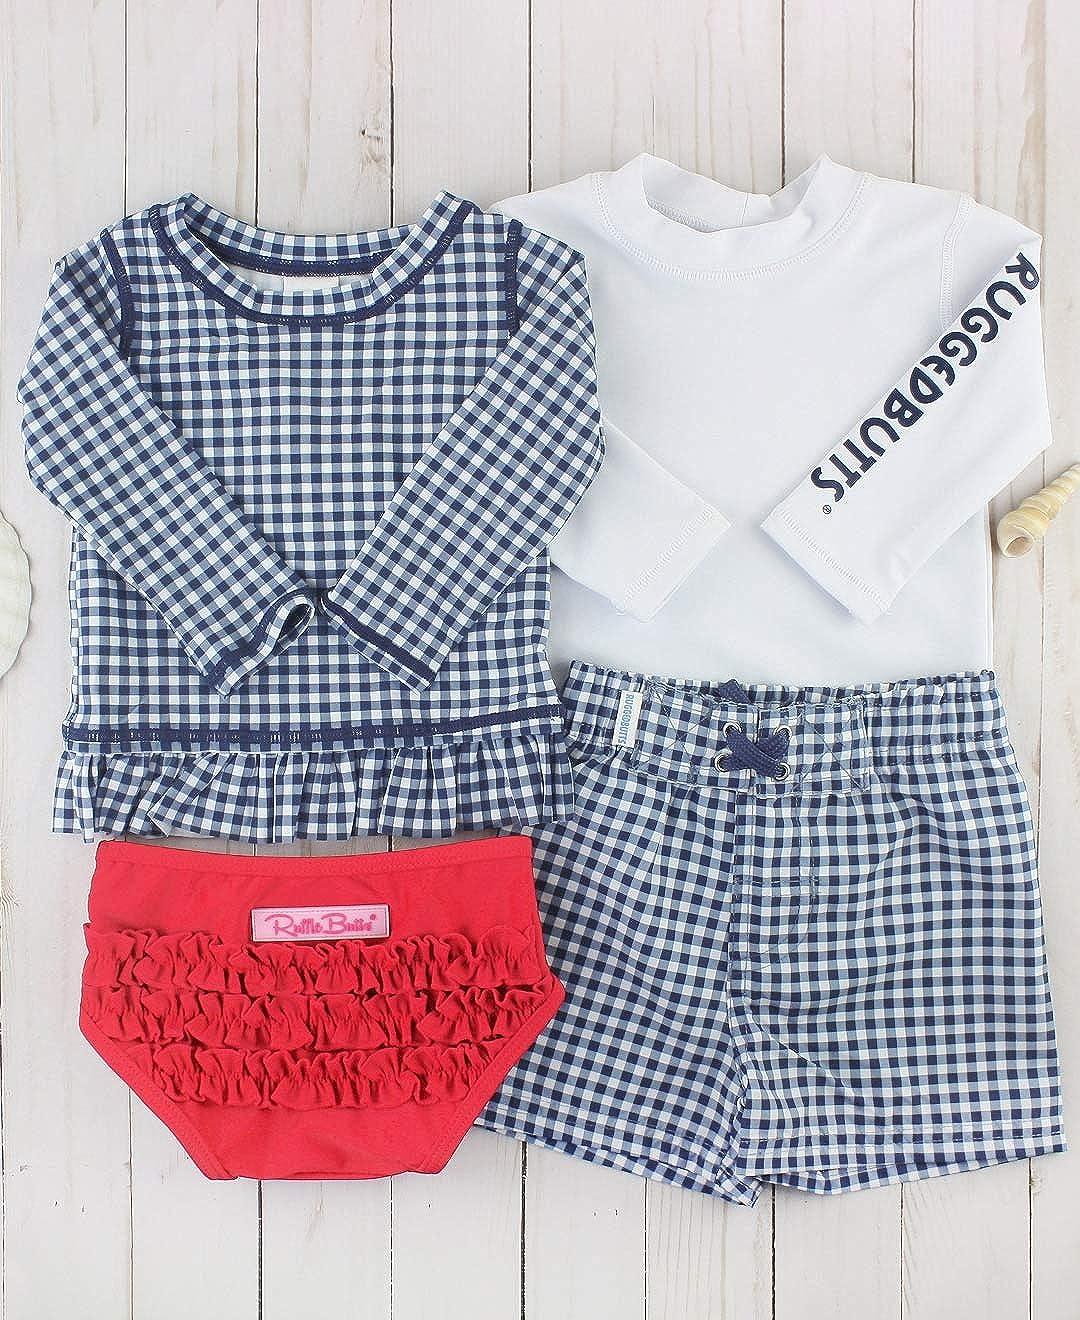 Sun Protection RGSYYXX-PRLS-SC-BABY RuffleButts Baby//Toddler Girls Rash Guard 2-Piece Swimsuit Set Long Sleeve Bikini with UPF 50